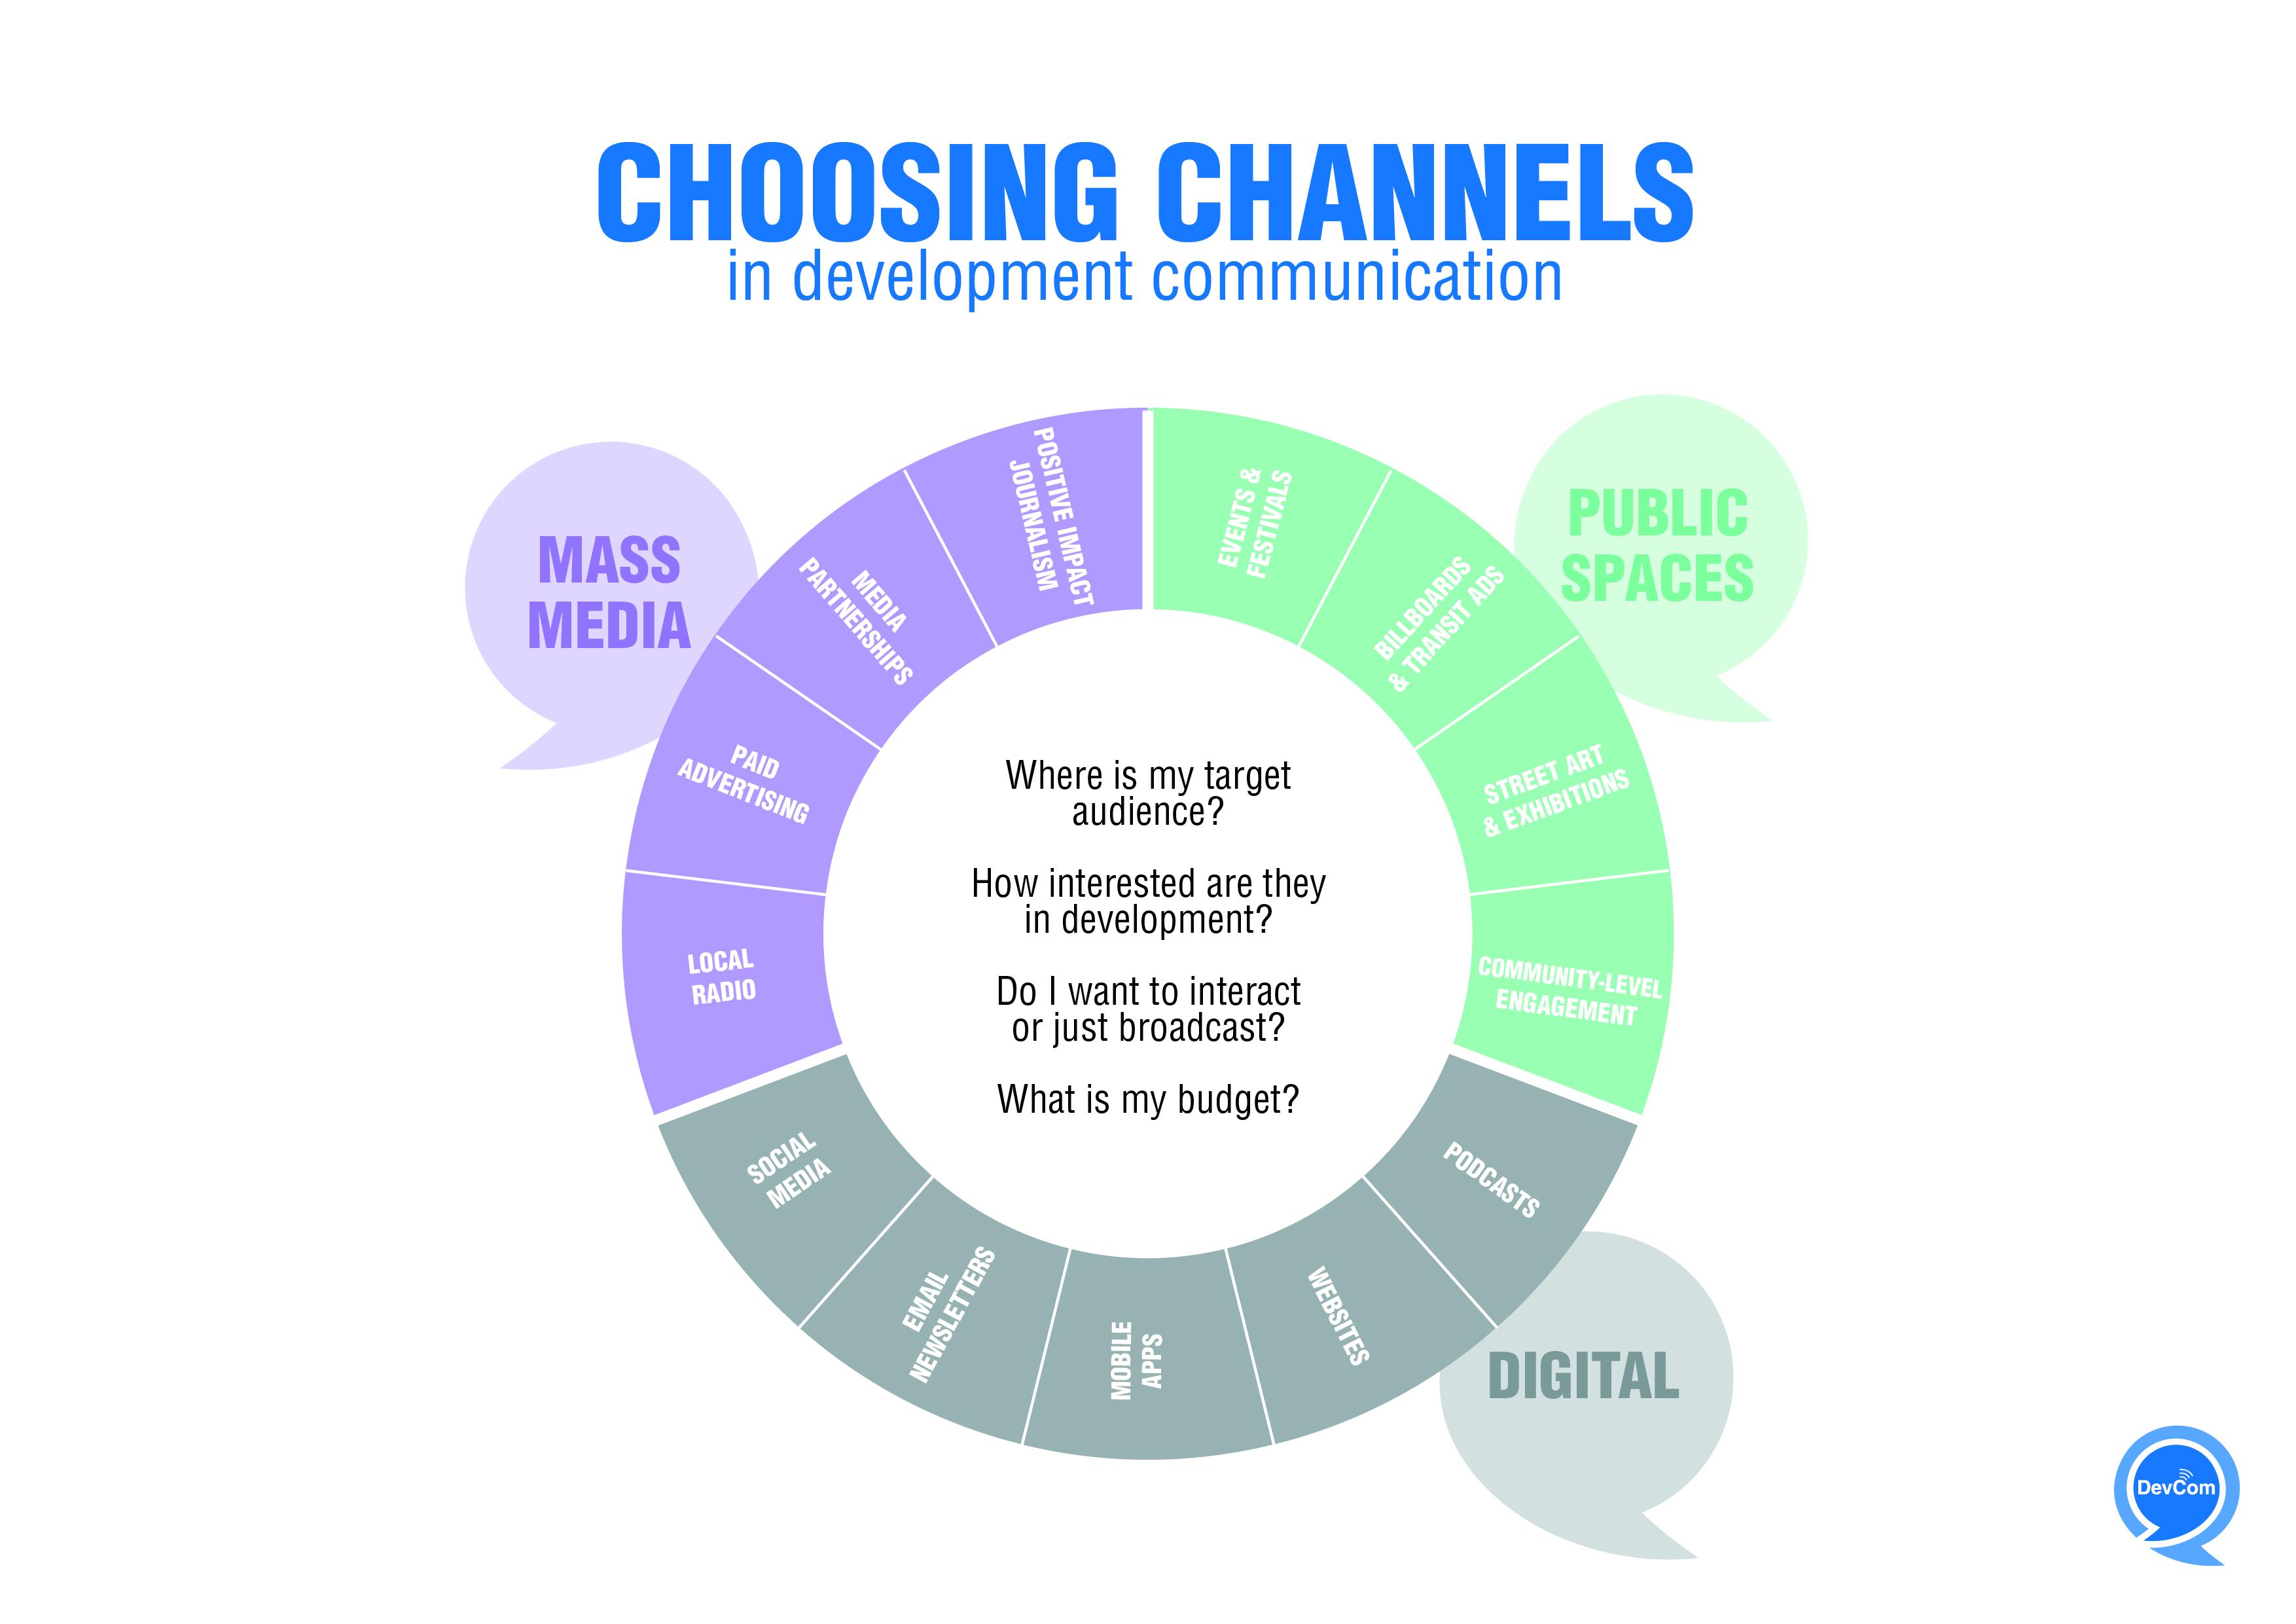 Infographic - Choosing channels in development communication